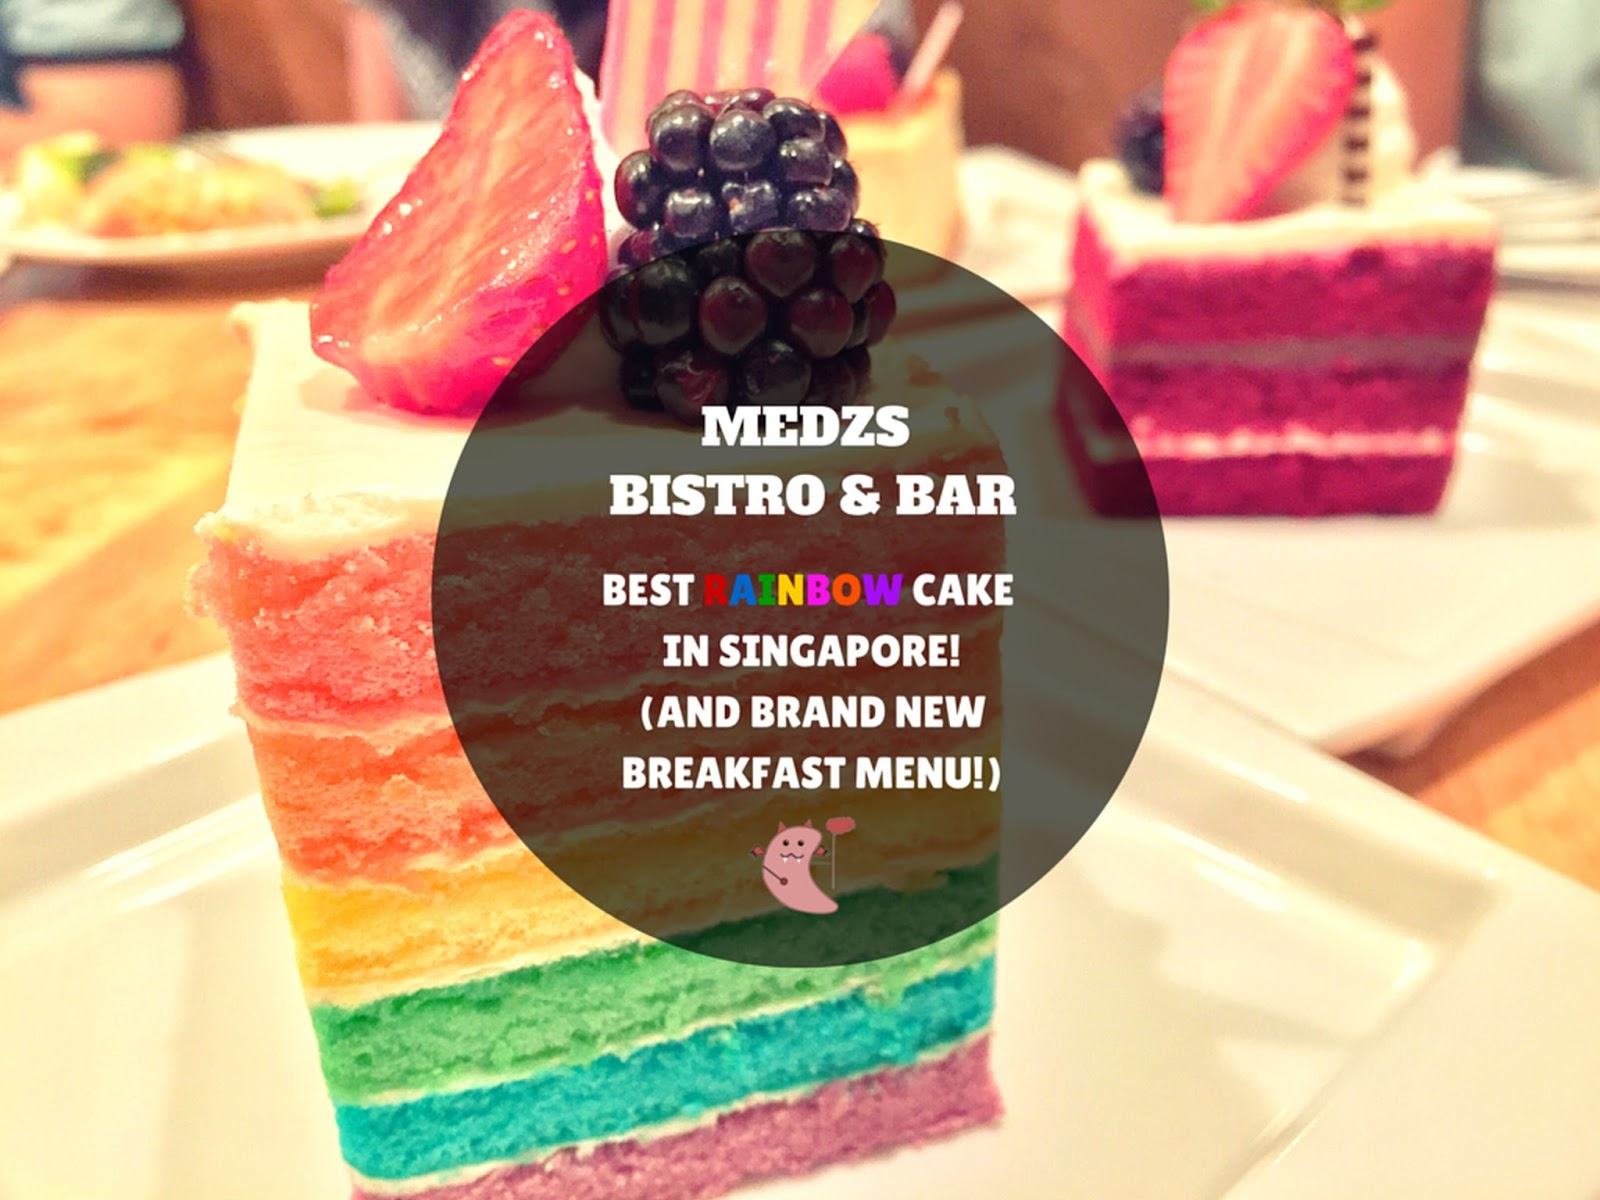 MEDZS Bistro & Bar (Raffles Place)